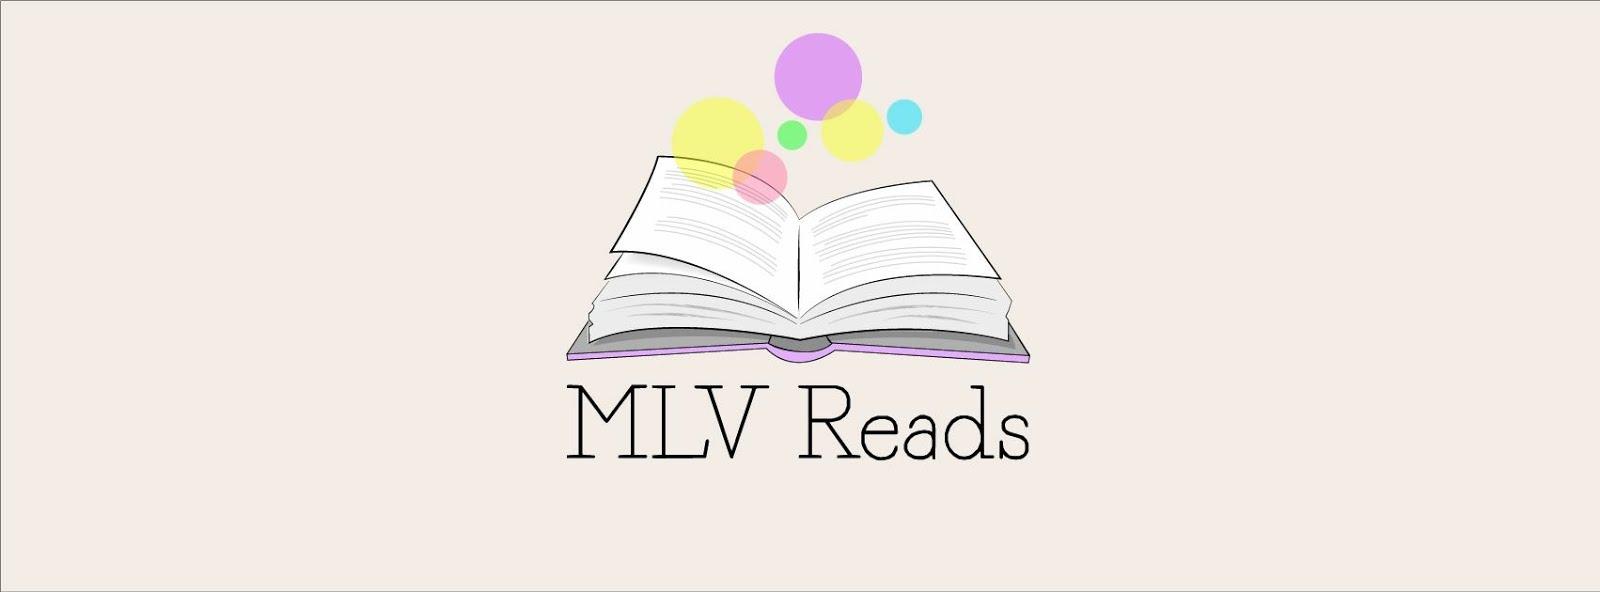 MLV Reads